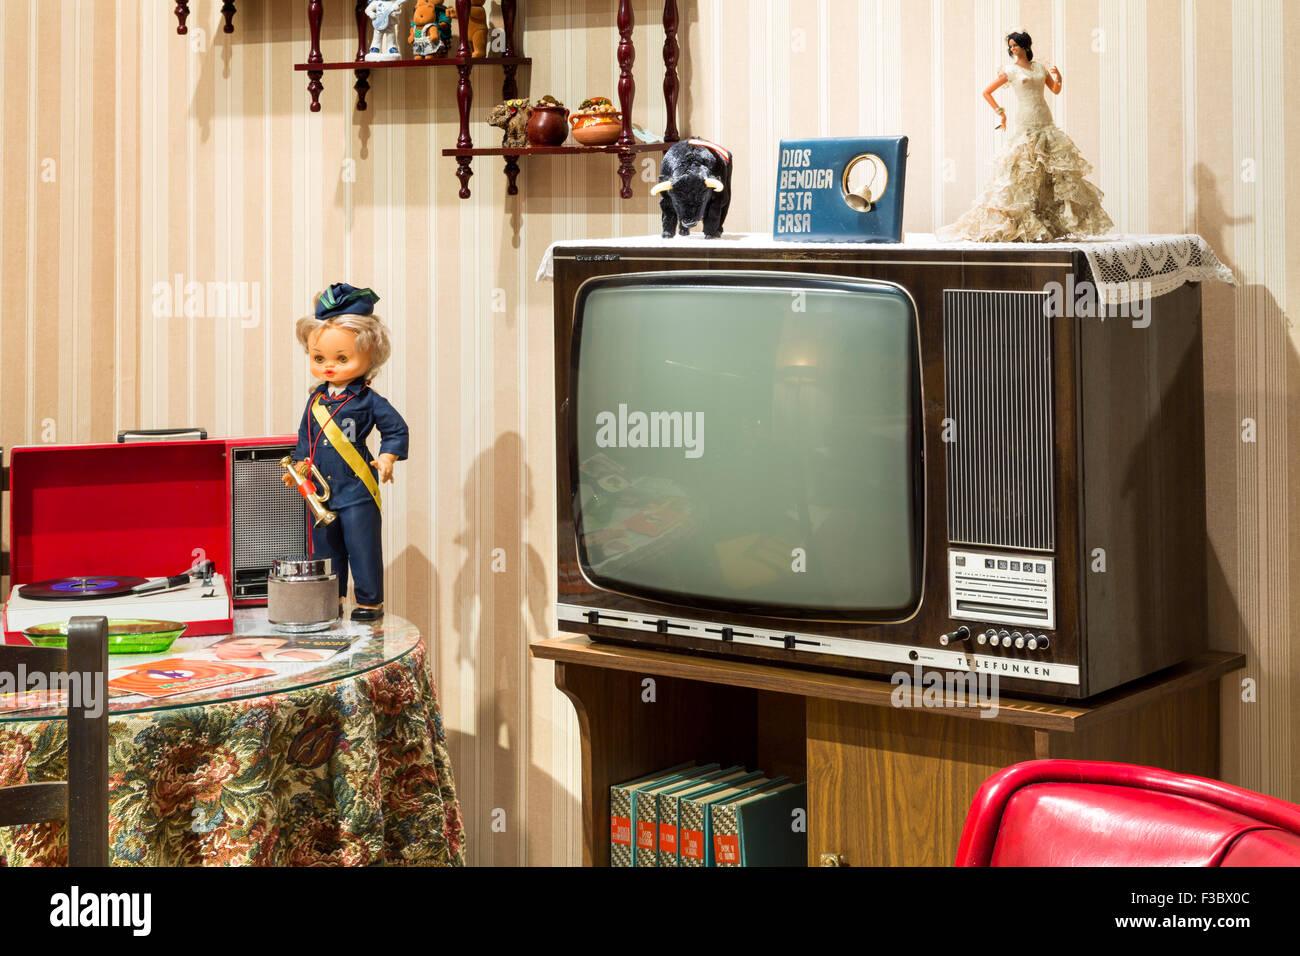 vintage tv wohnzimmer der 70er jahre stockfoto bild 88157676 alamy. Black Bedroom Furniture Sets. Home Design Ideas